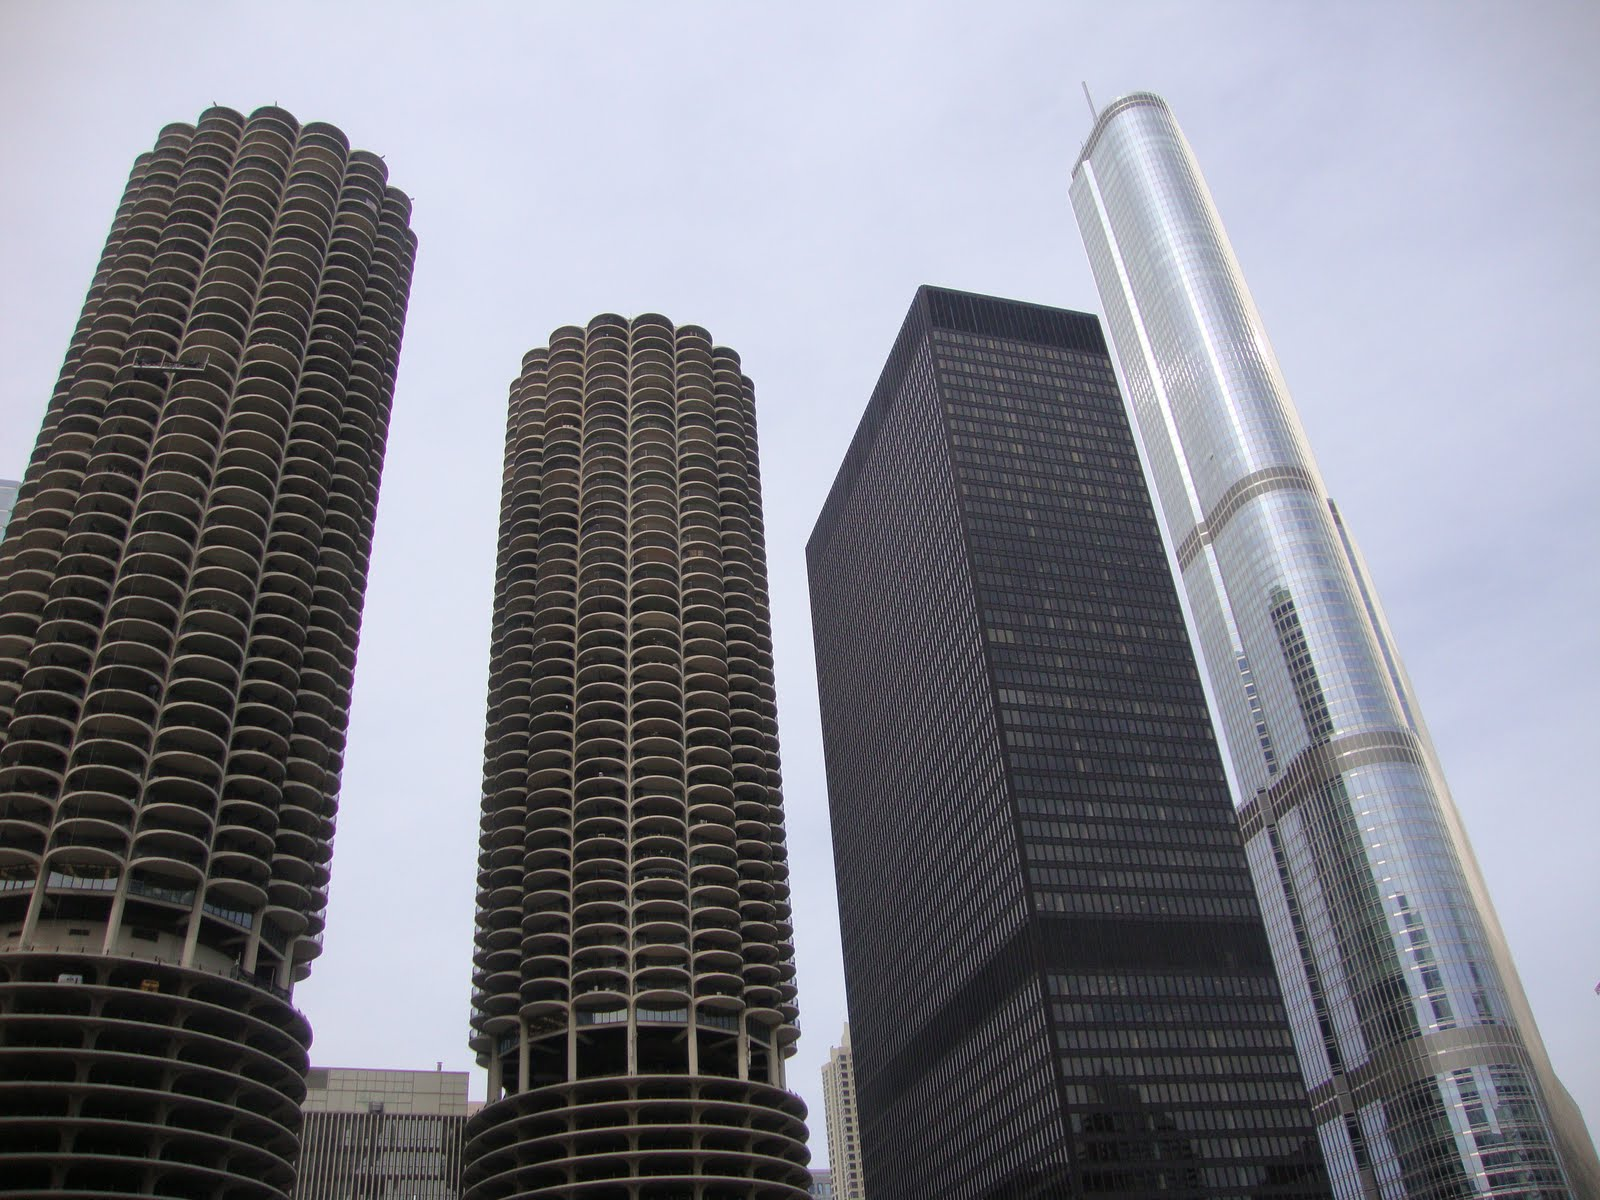 Chicago Mies Van Der Rohe Tour tom's architecture articles: mies van der rohe's buildings